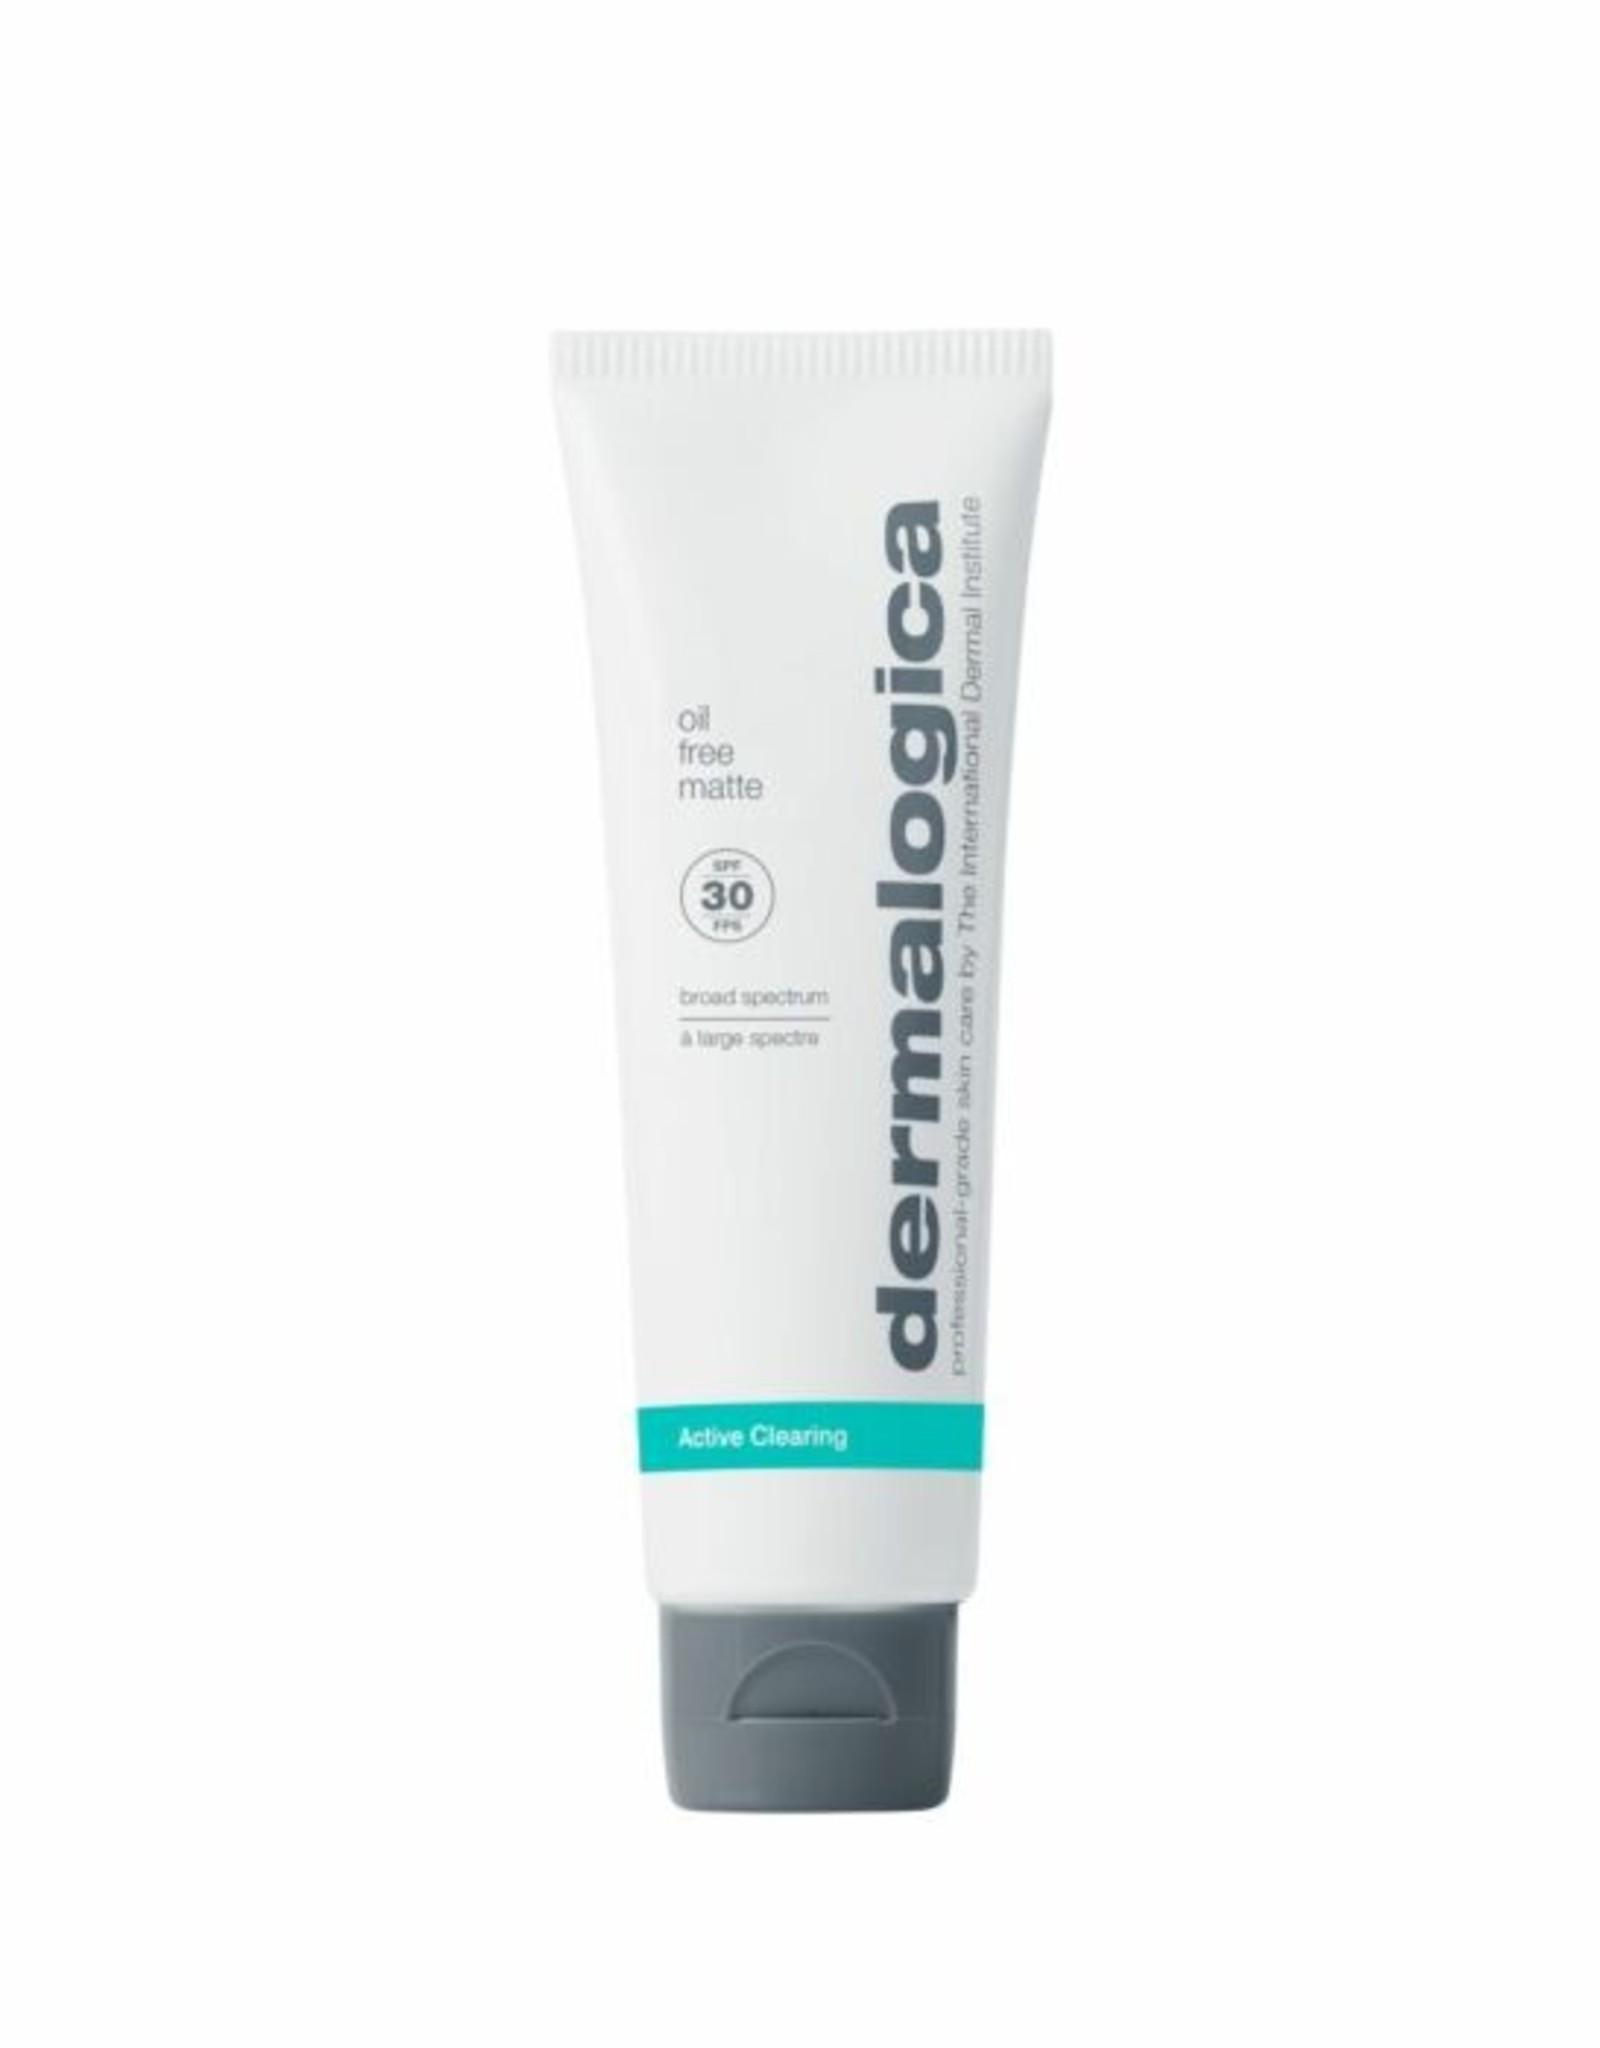 Dermalogica Active Clearing - Oil Free Matte Spf30 50ml - Dermalogica